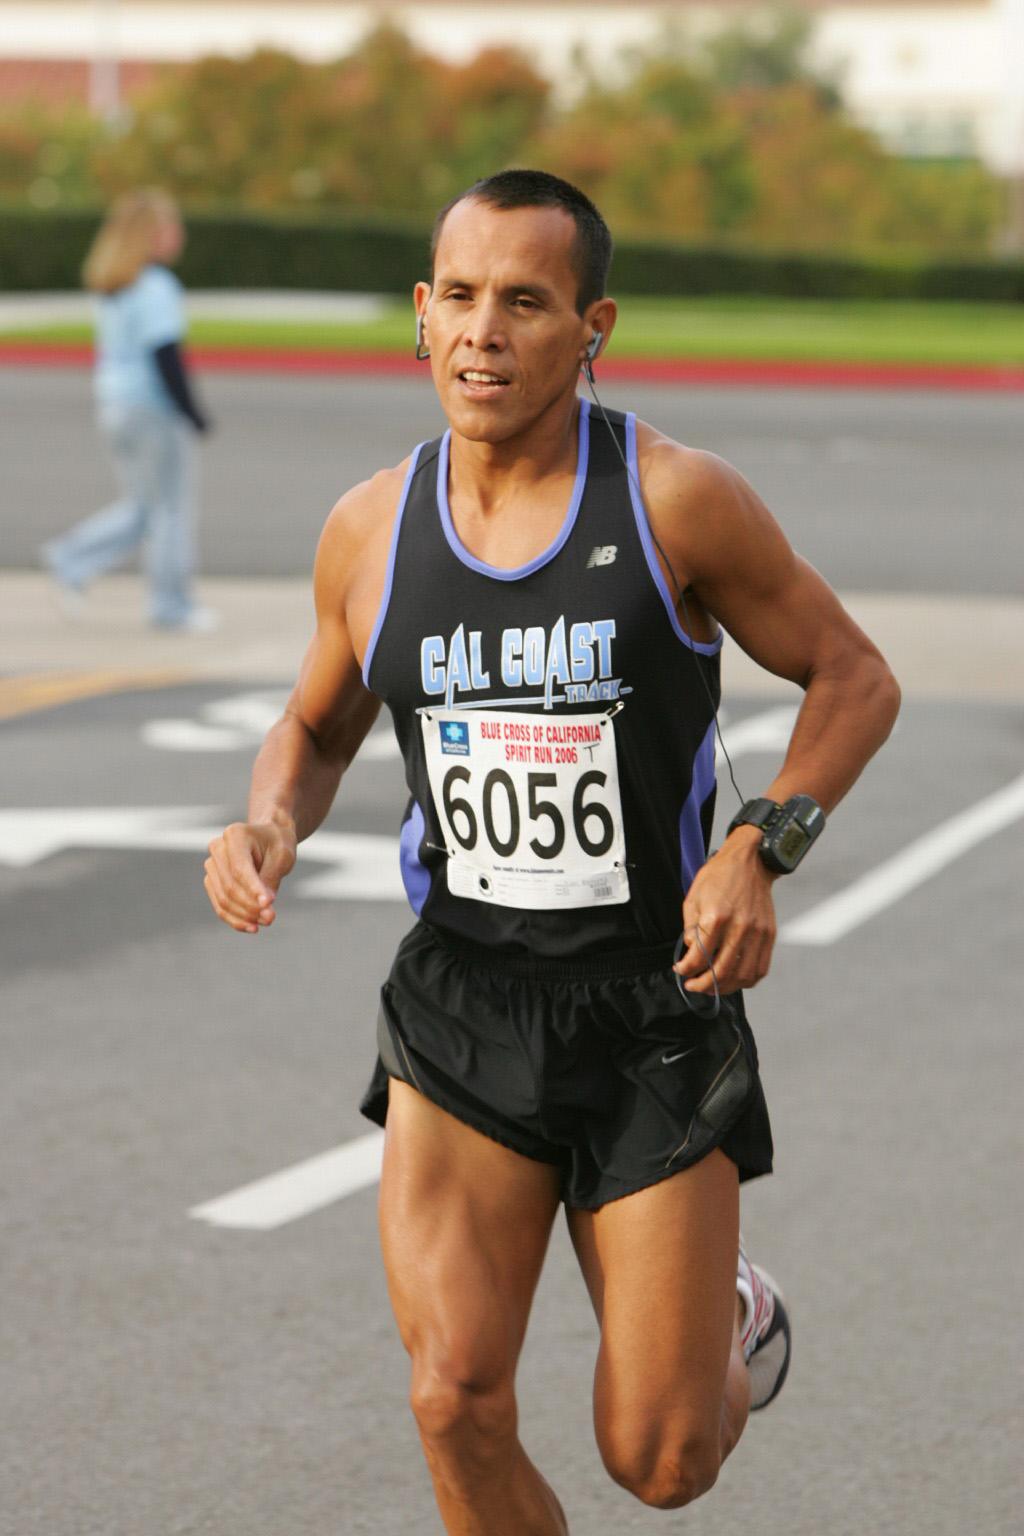 Juan running Spirit Run 2006. He won the 10k and also raced the 5k that year.